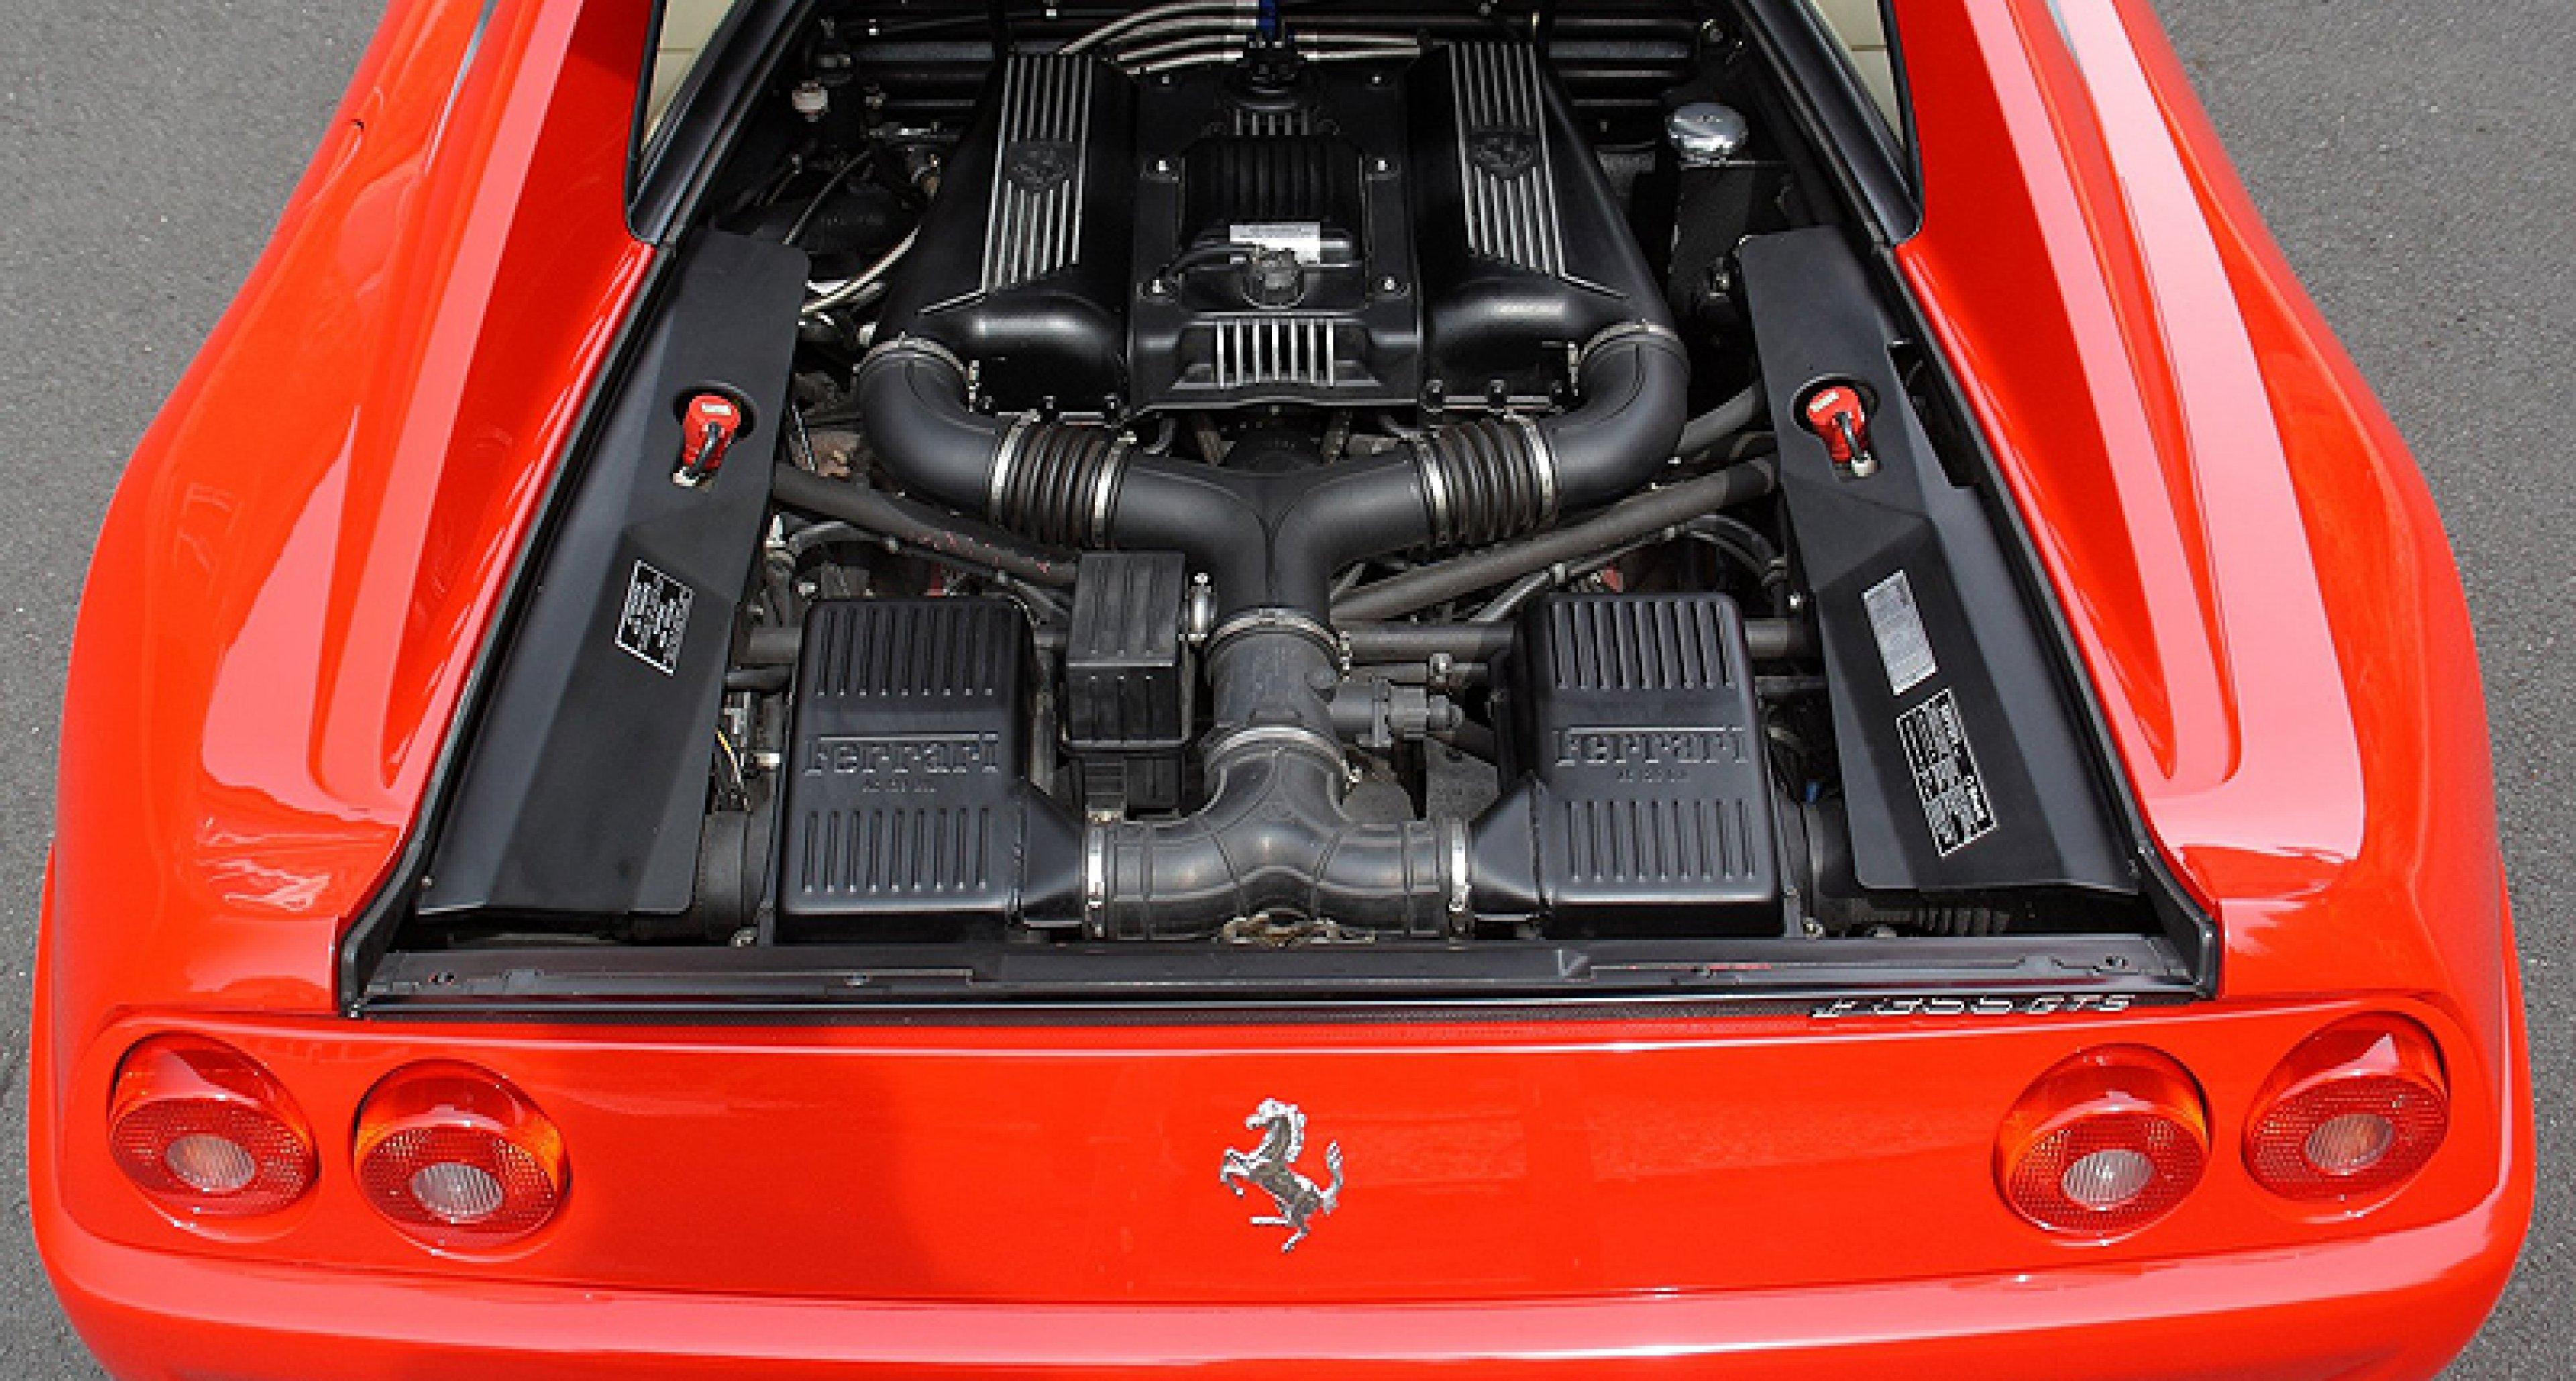 Ferrari 355 Gts Endlich Erwachsen Classic Driver Magazine